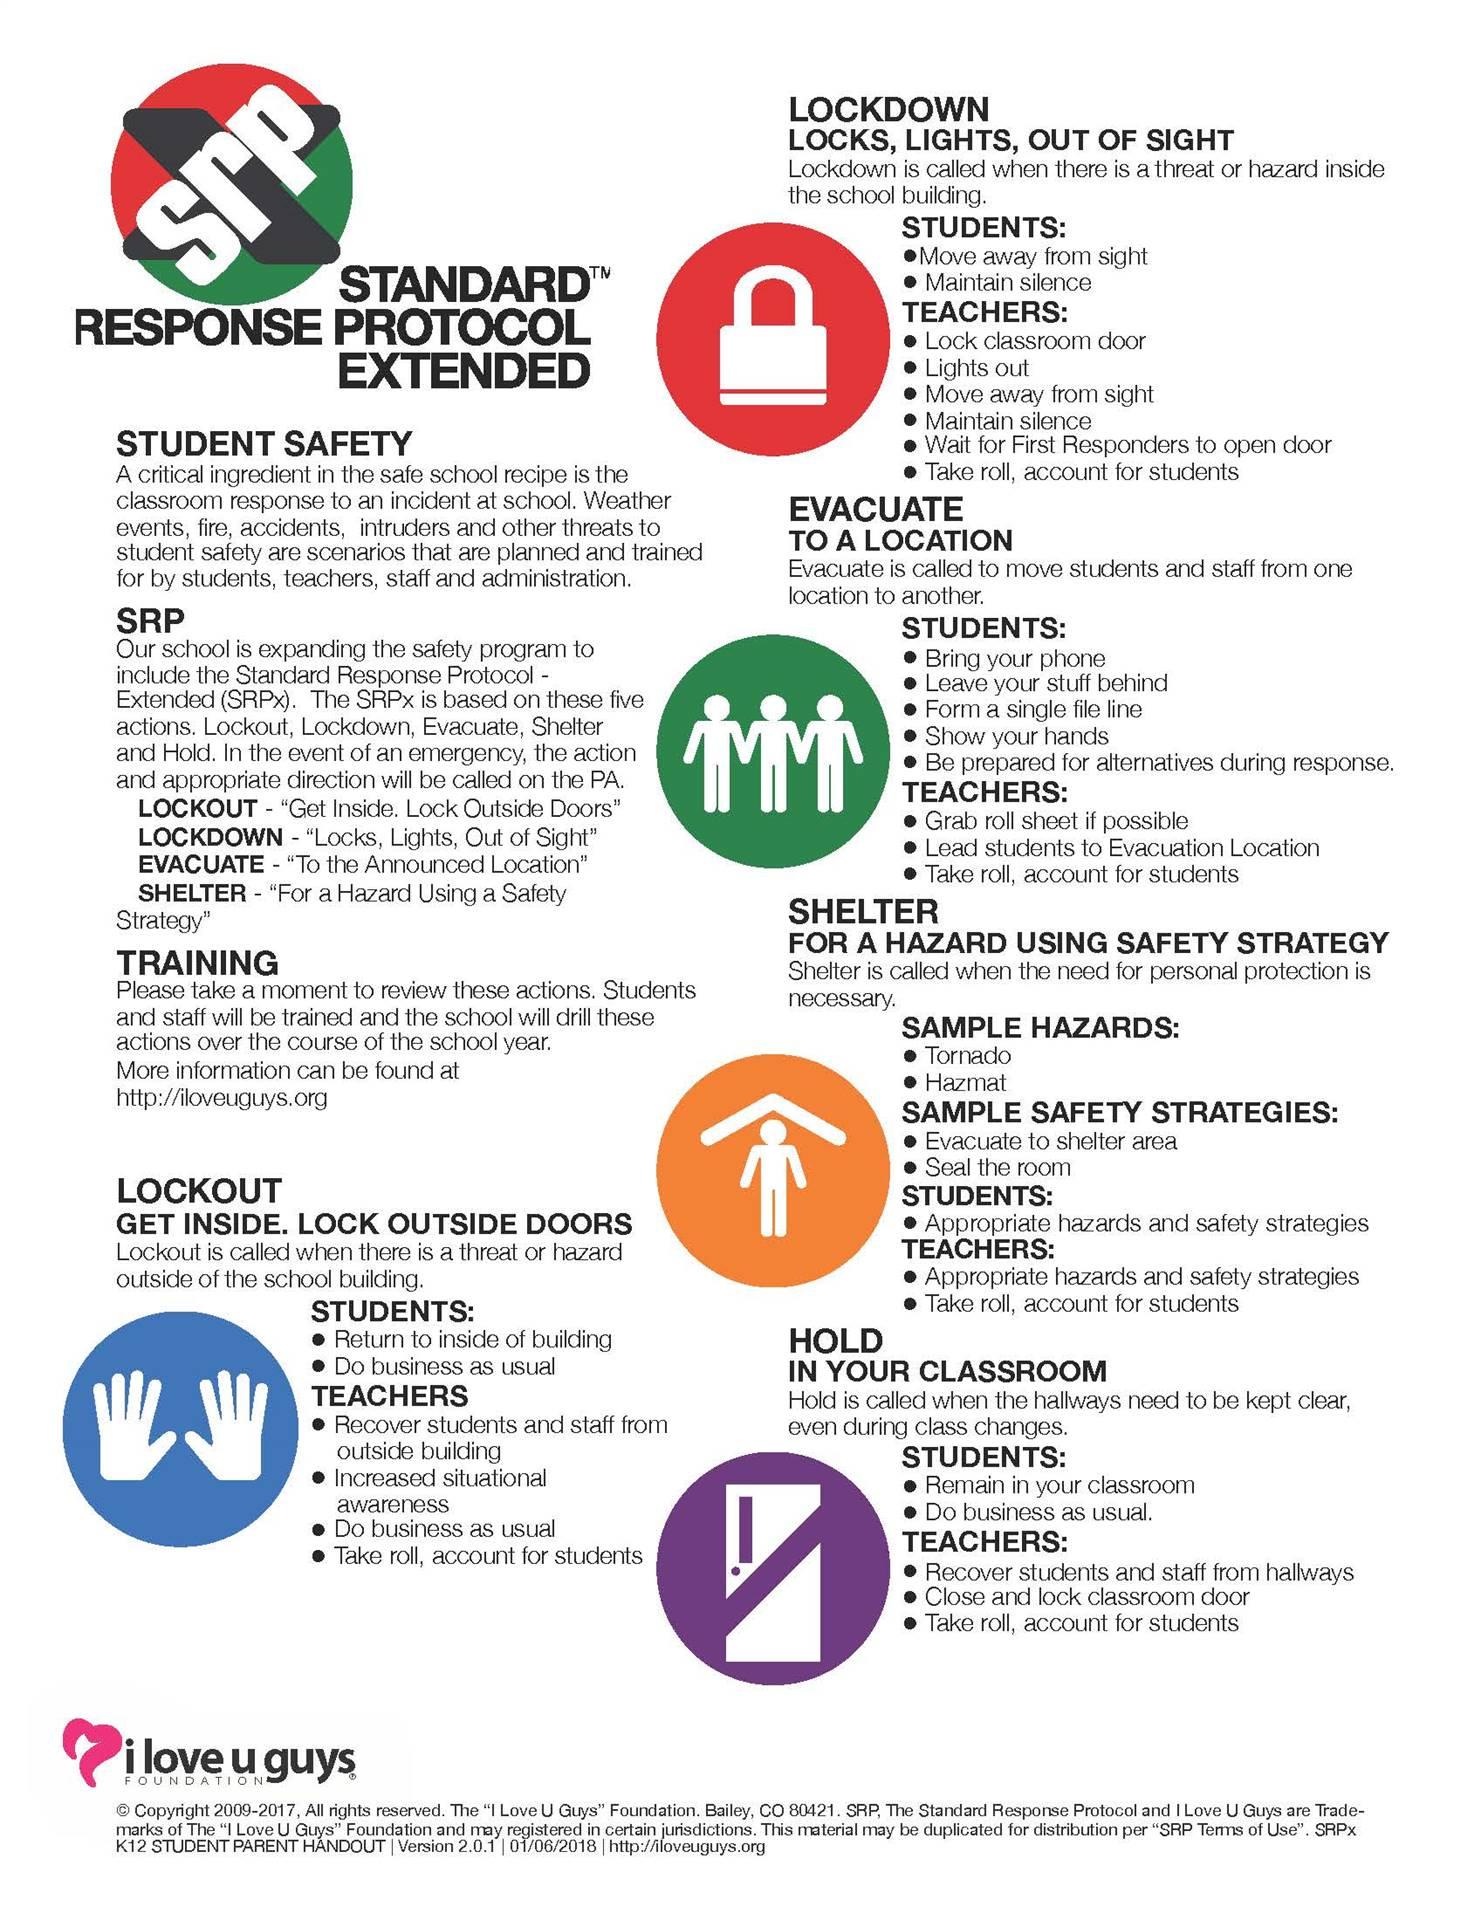 Standard Response Protocol